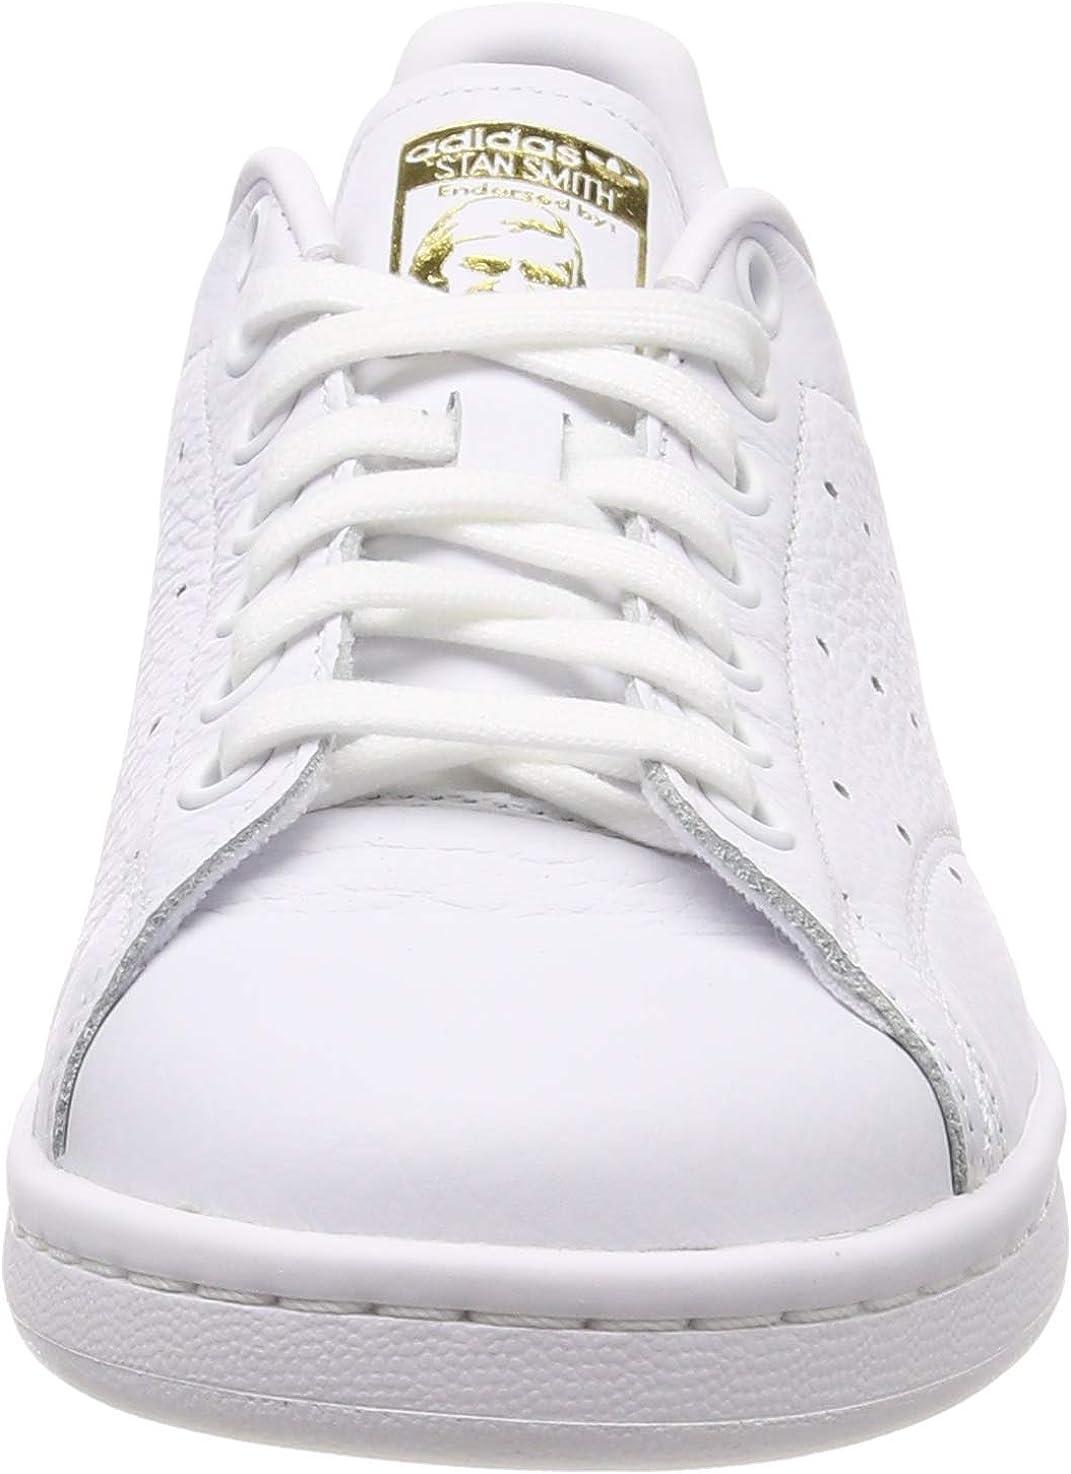 adidas Stan Smith W, Scarpe da Ginnastica Basse Donna Bianco White Cg6014